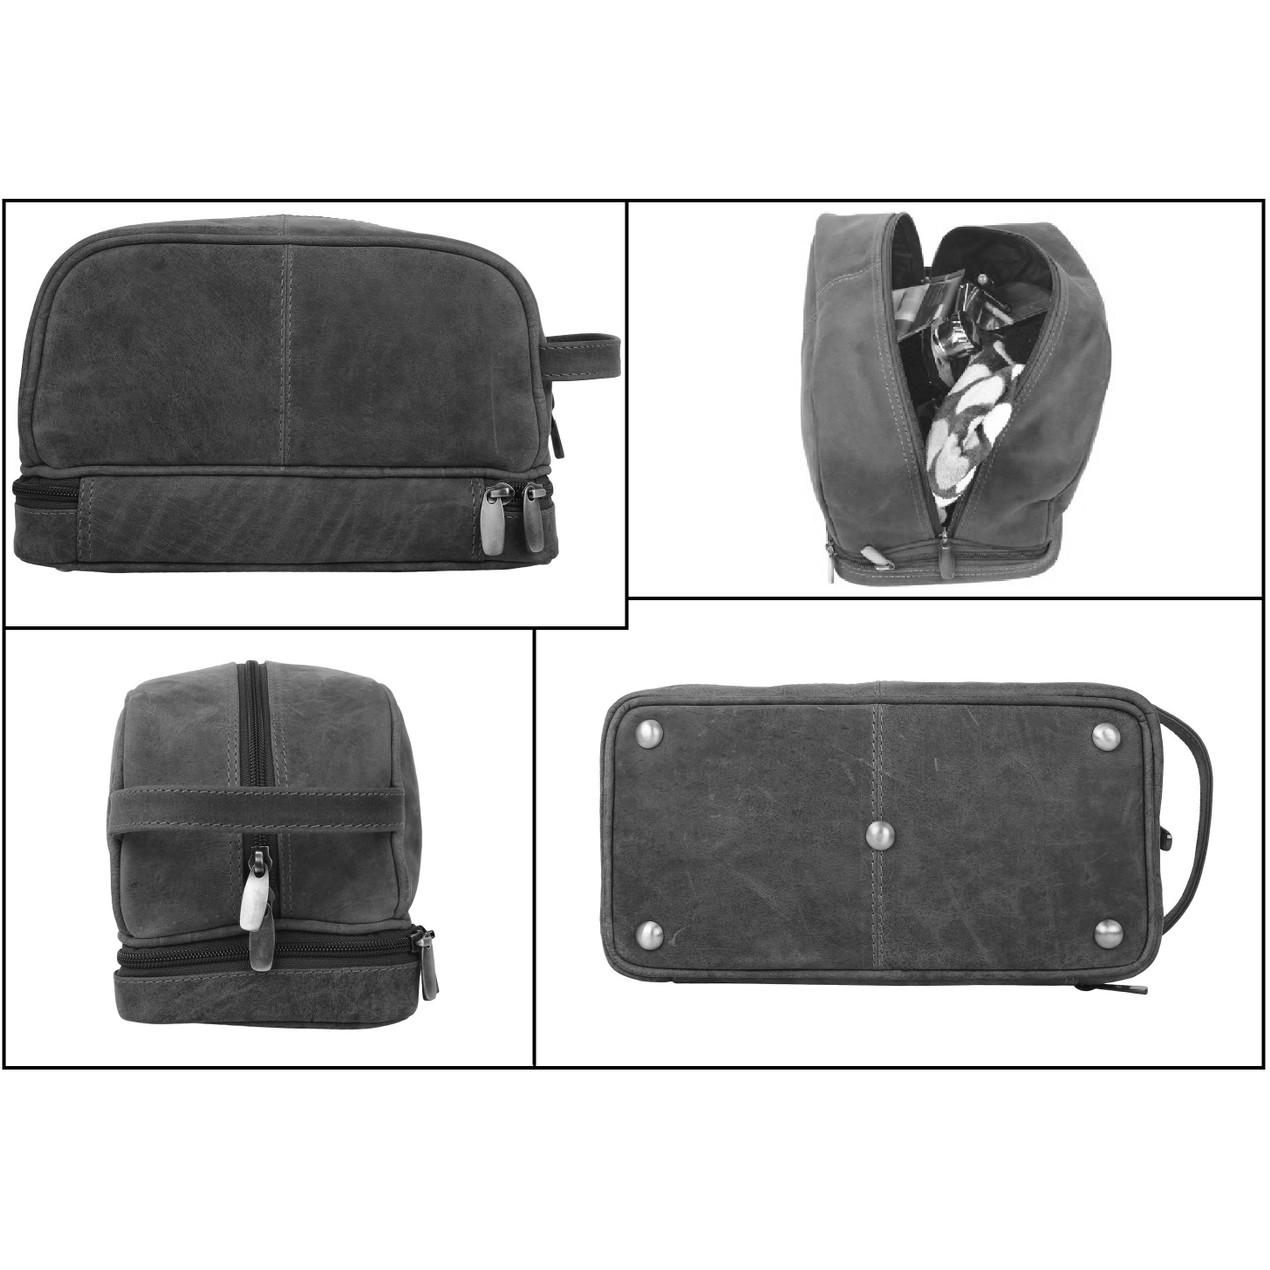 43a0a2a86a ... Handmade Genuine Buffalo Leather Toiletry Bag Dopp Shaving and Grooming  Kit ...